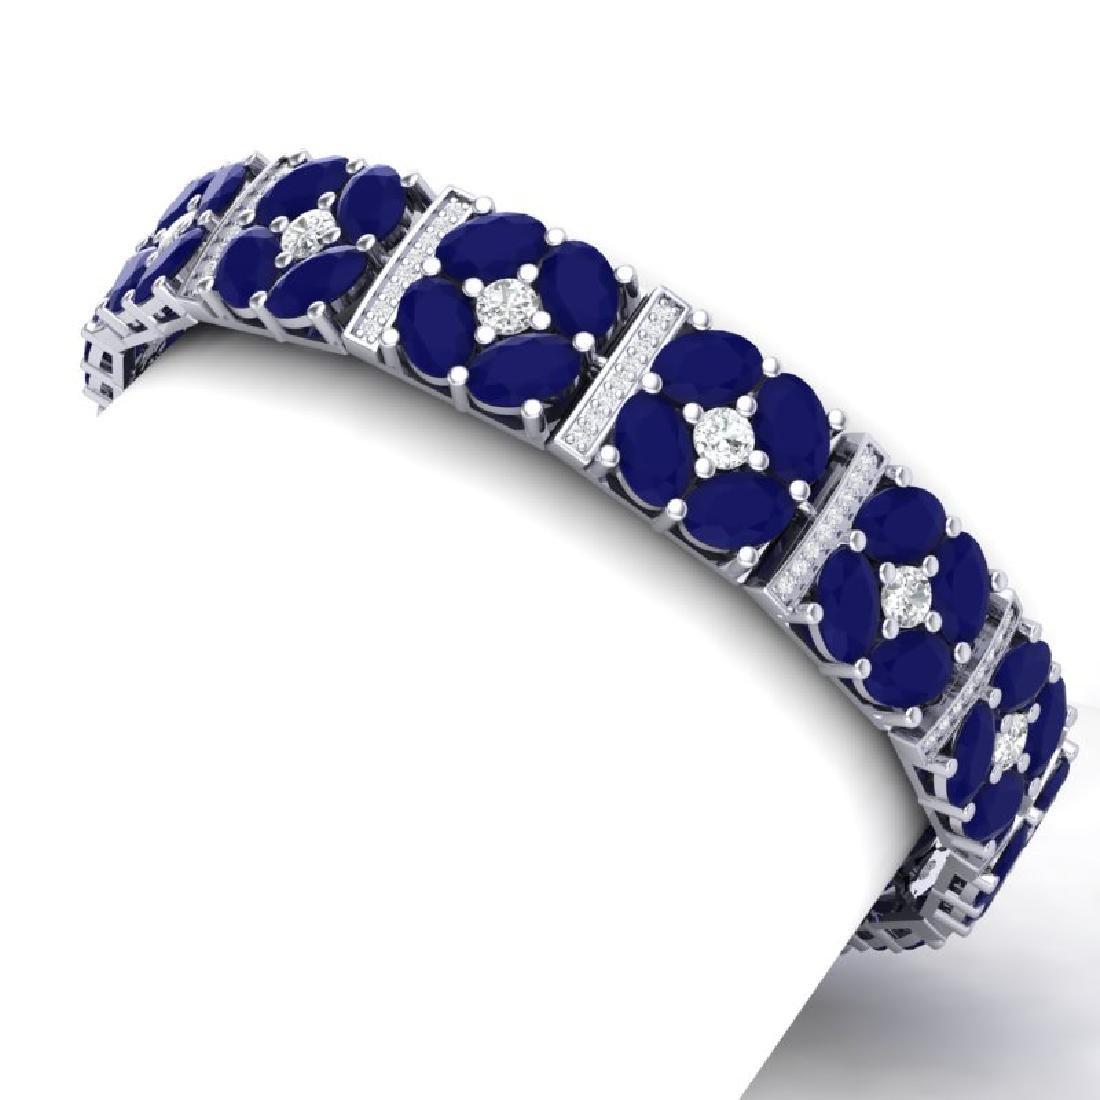 48.04 CTW Royalty Sapphire & VS Diamond Bracelet 18K - 2